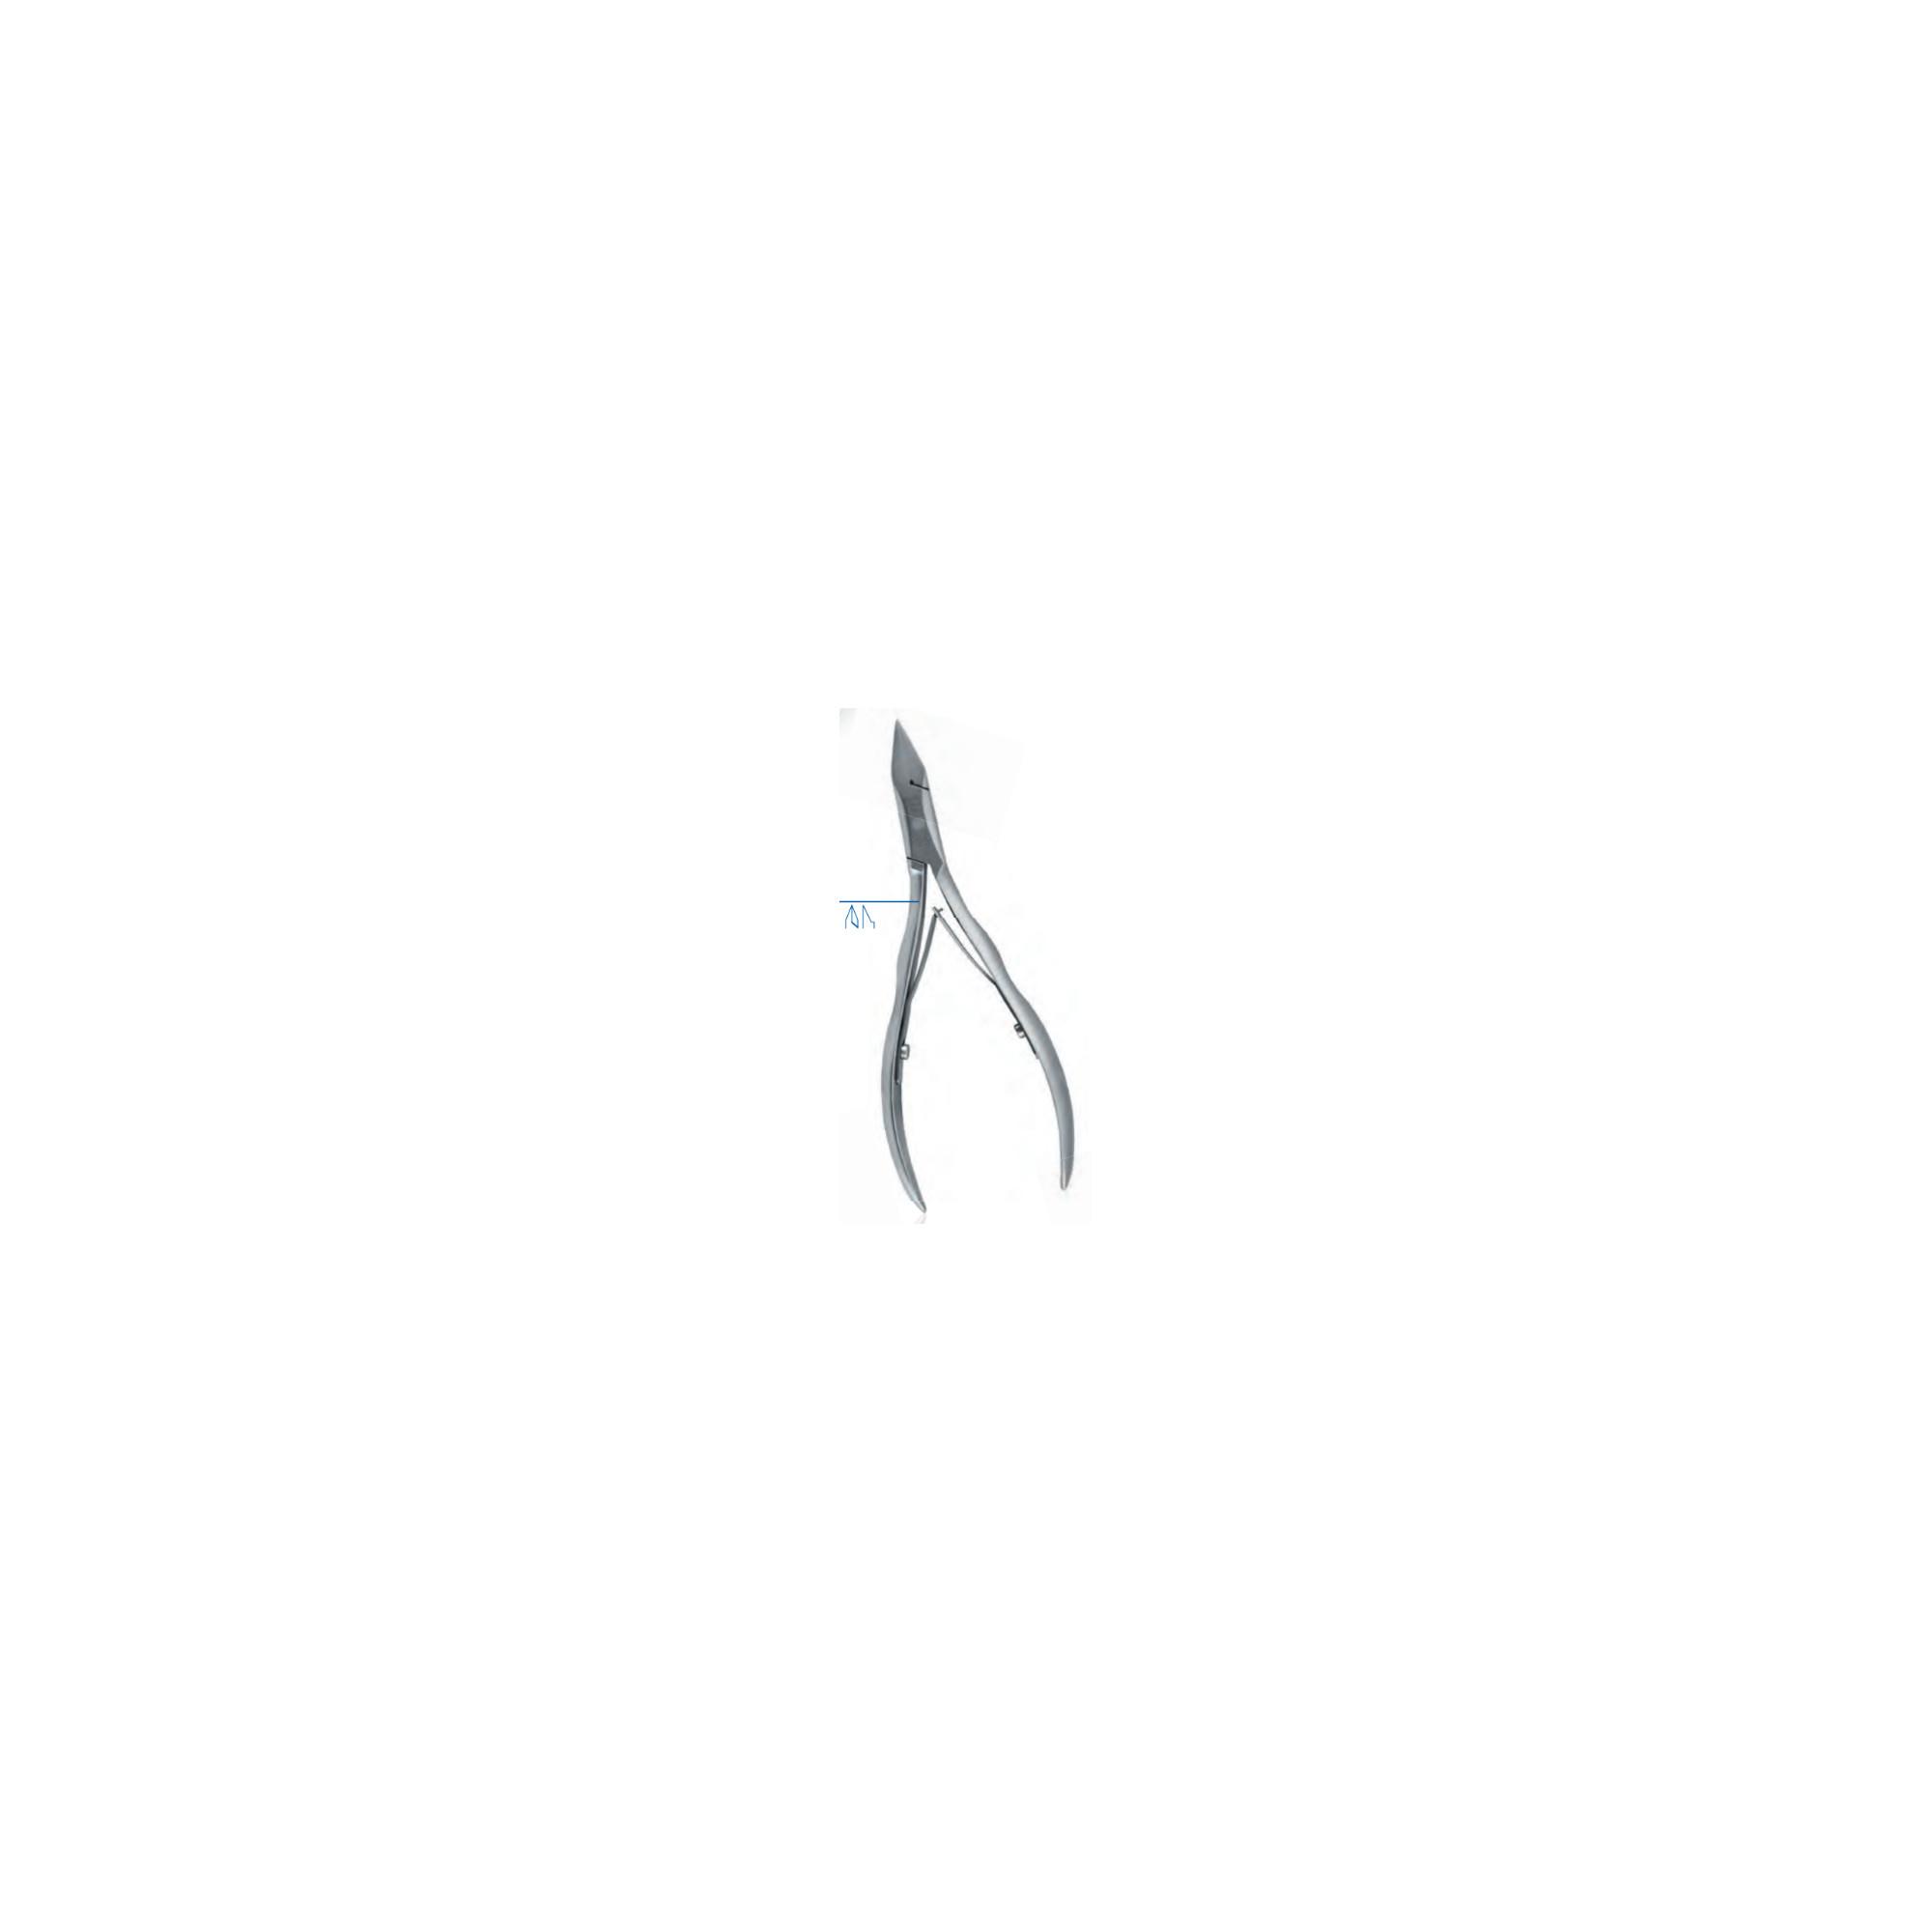 Pince à ongles - Coupe droite - Mors plats - 11,5 cm - Dovo